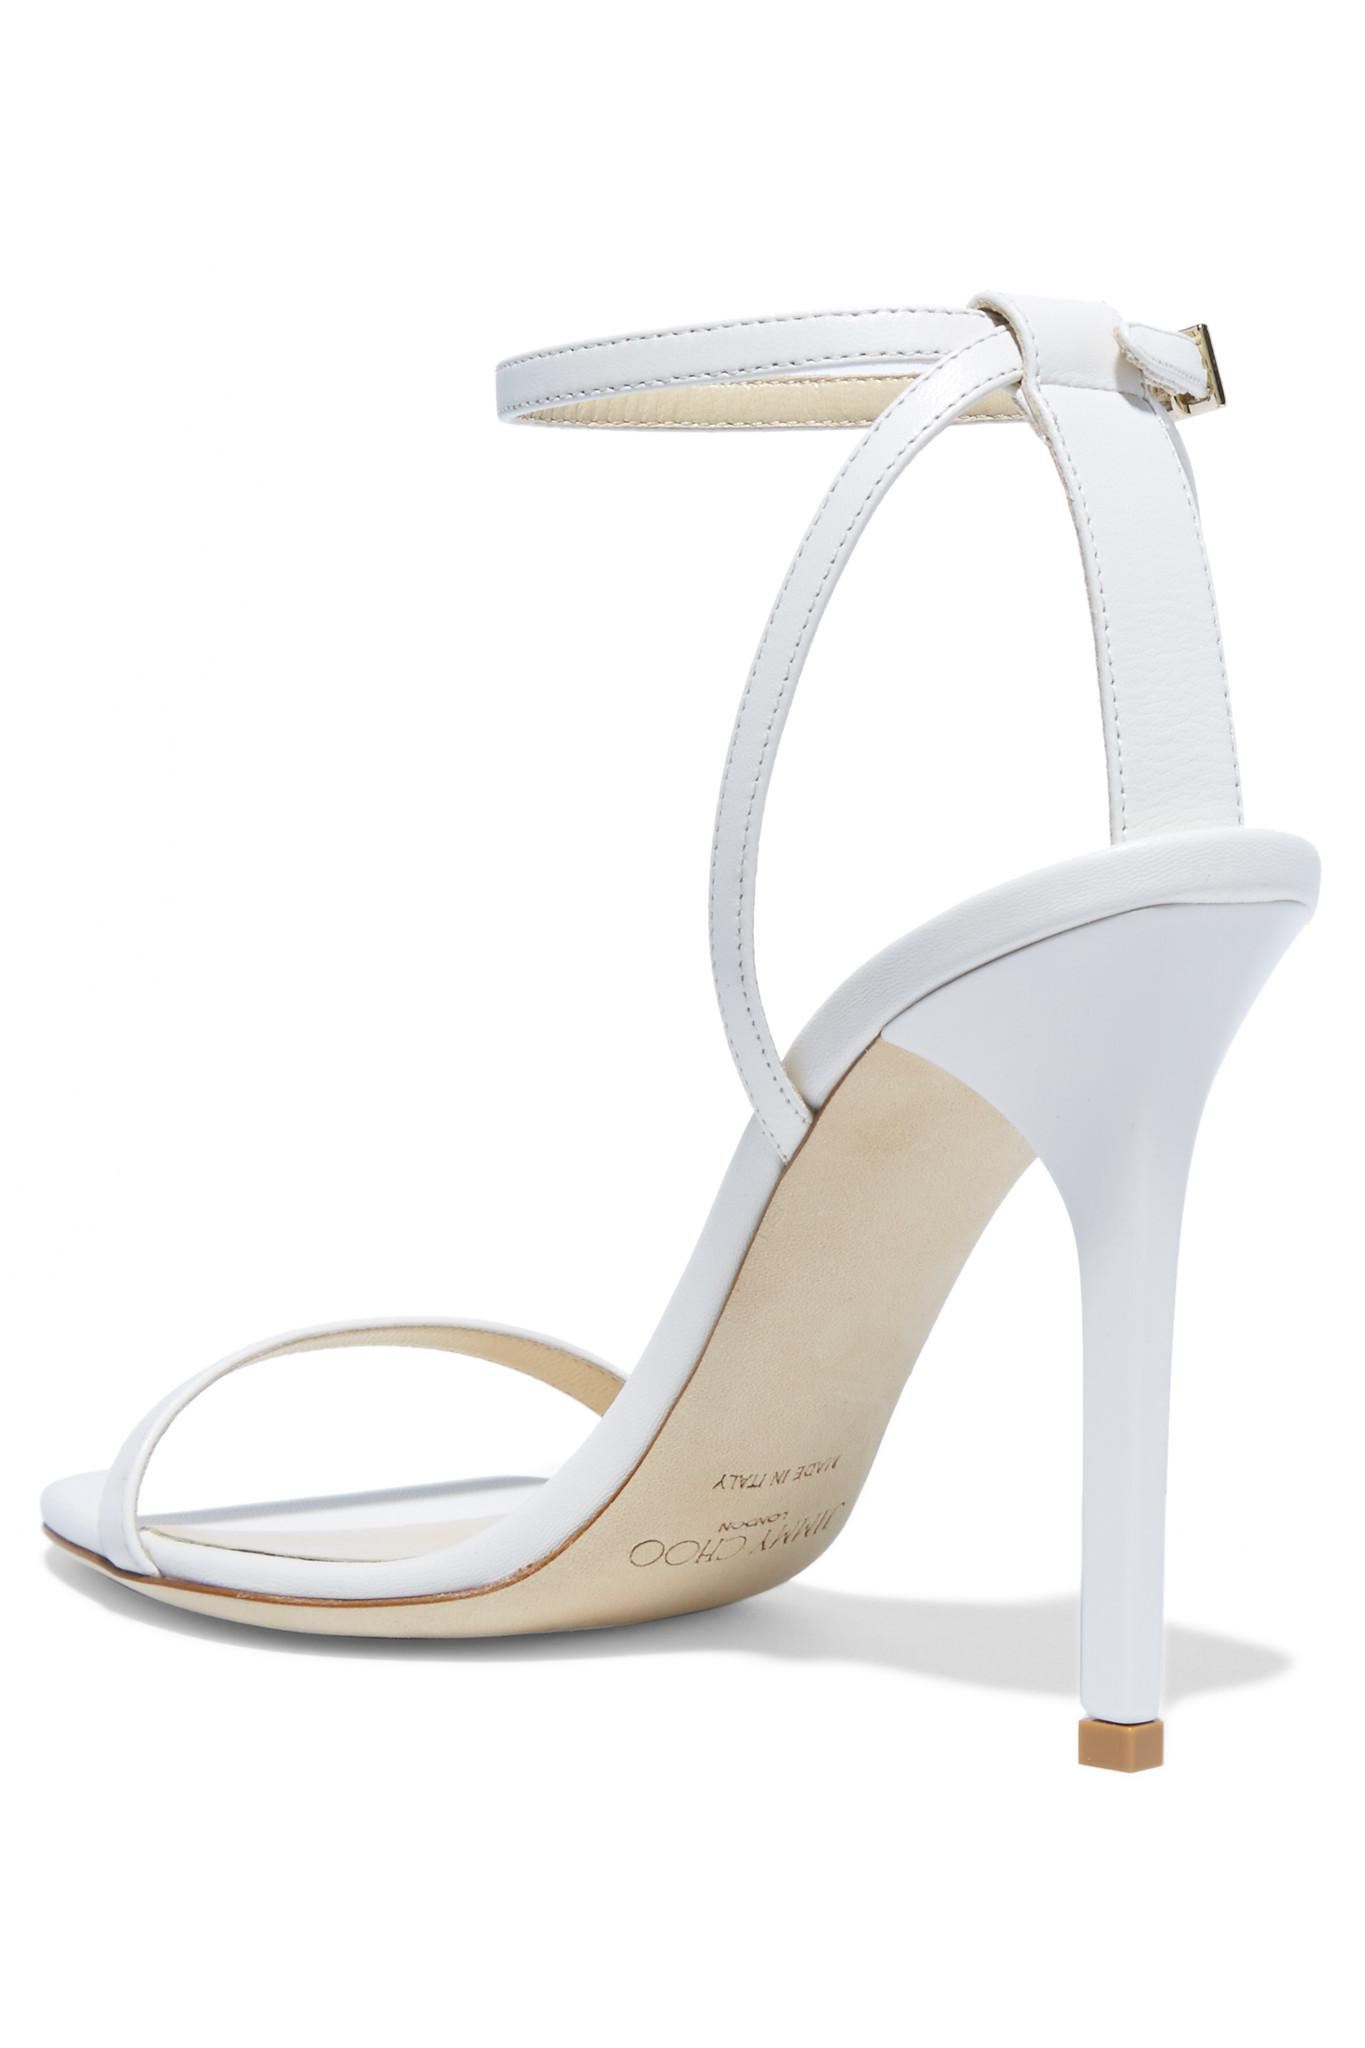 dae7320c7b8 Lyst - Jimmy Choo Minny Leather Sandals in White